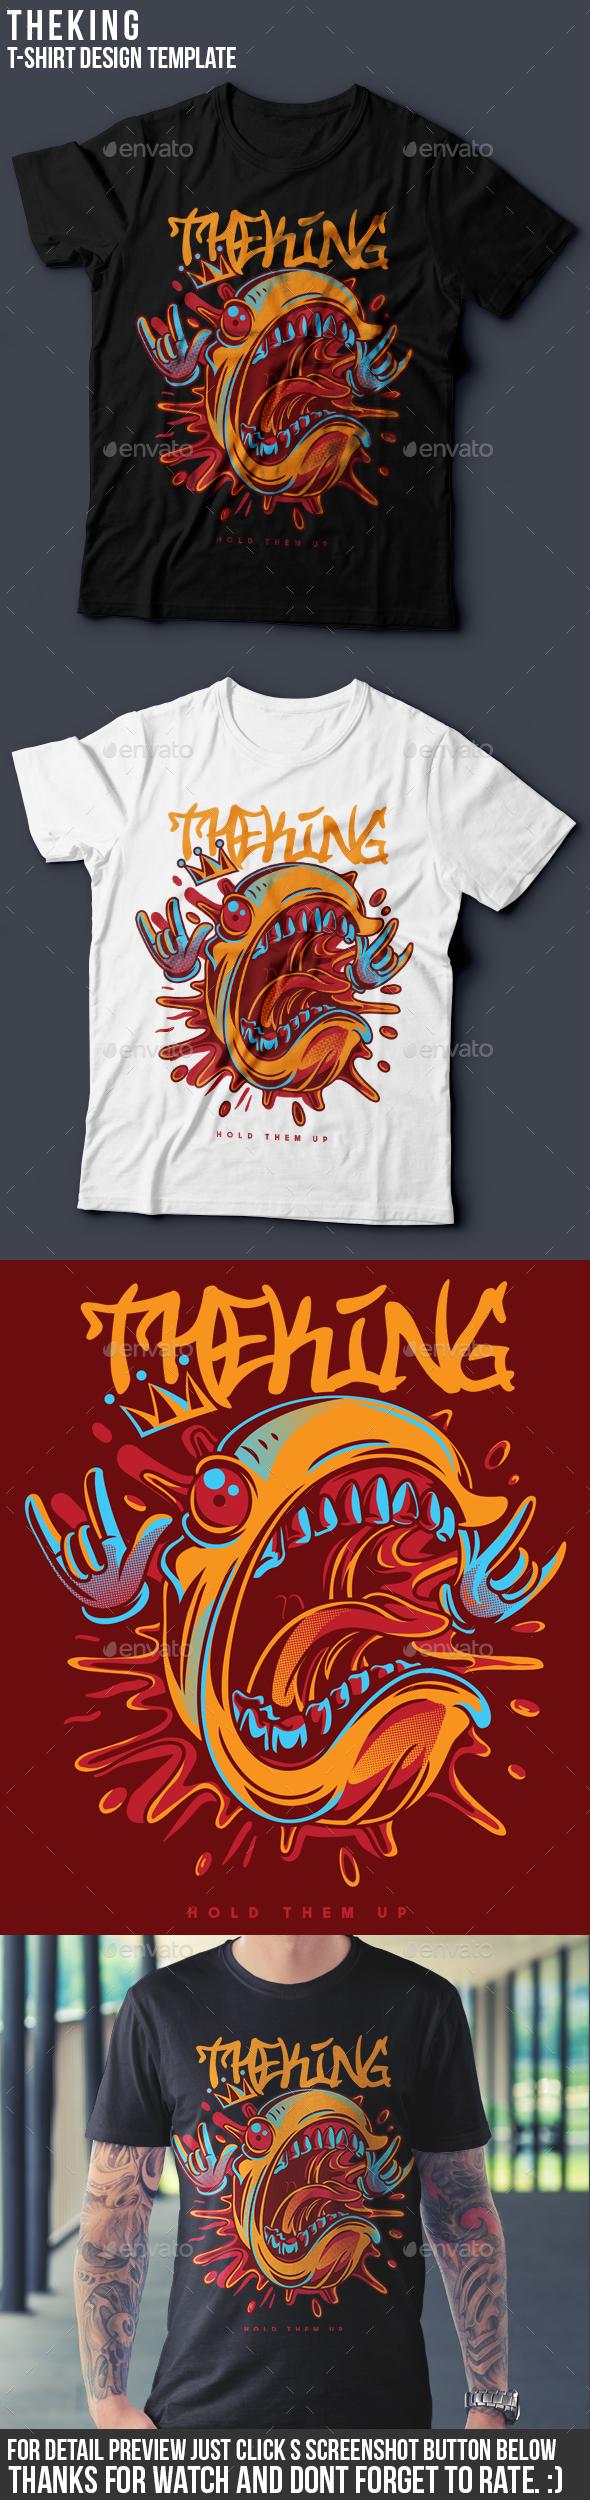 The King T-Shirt Design - Clean Designs